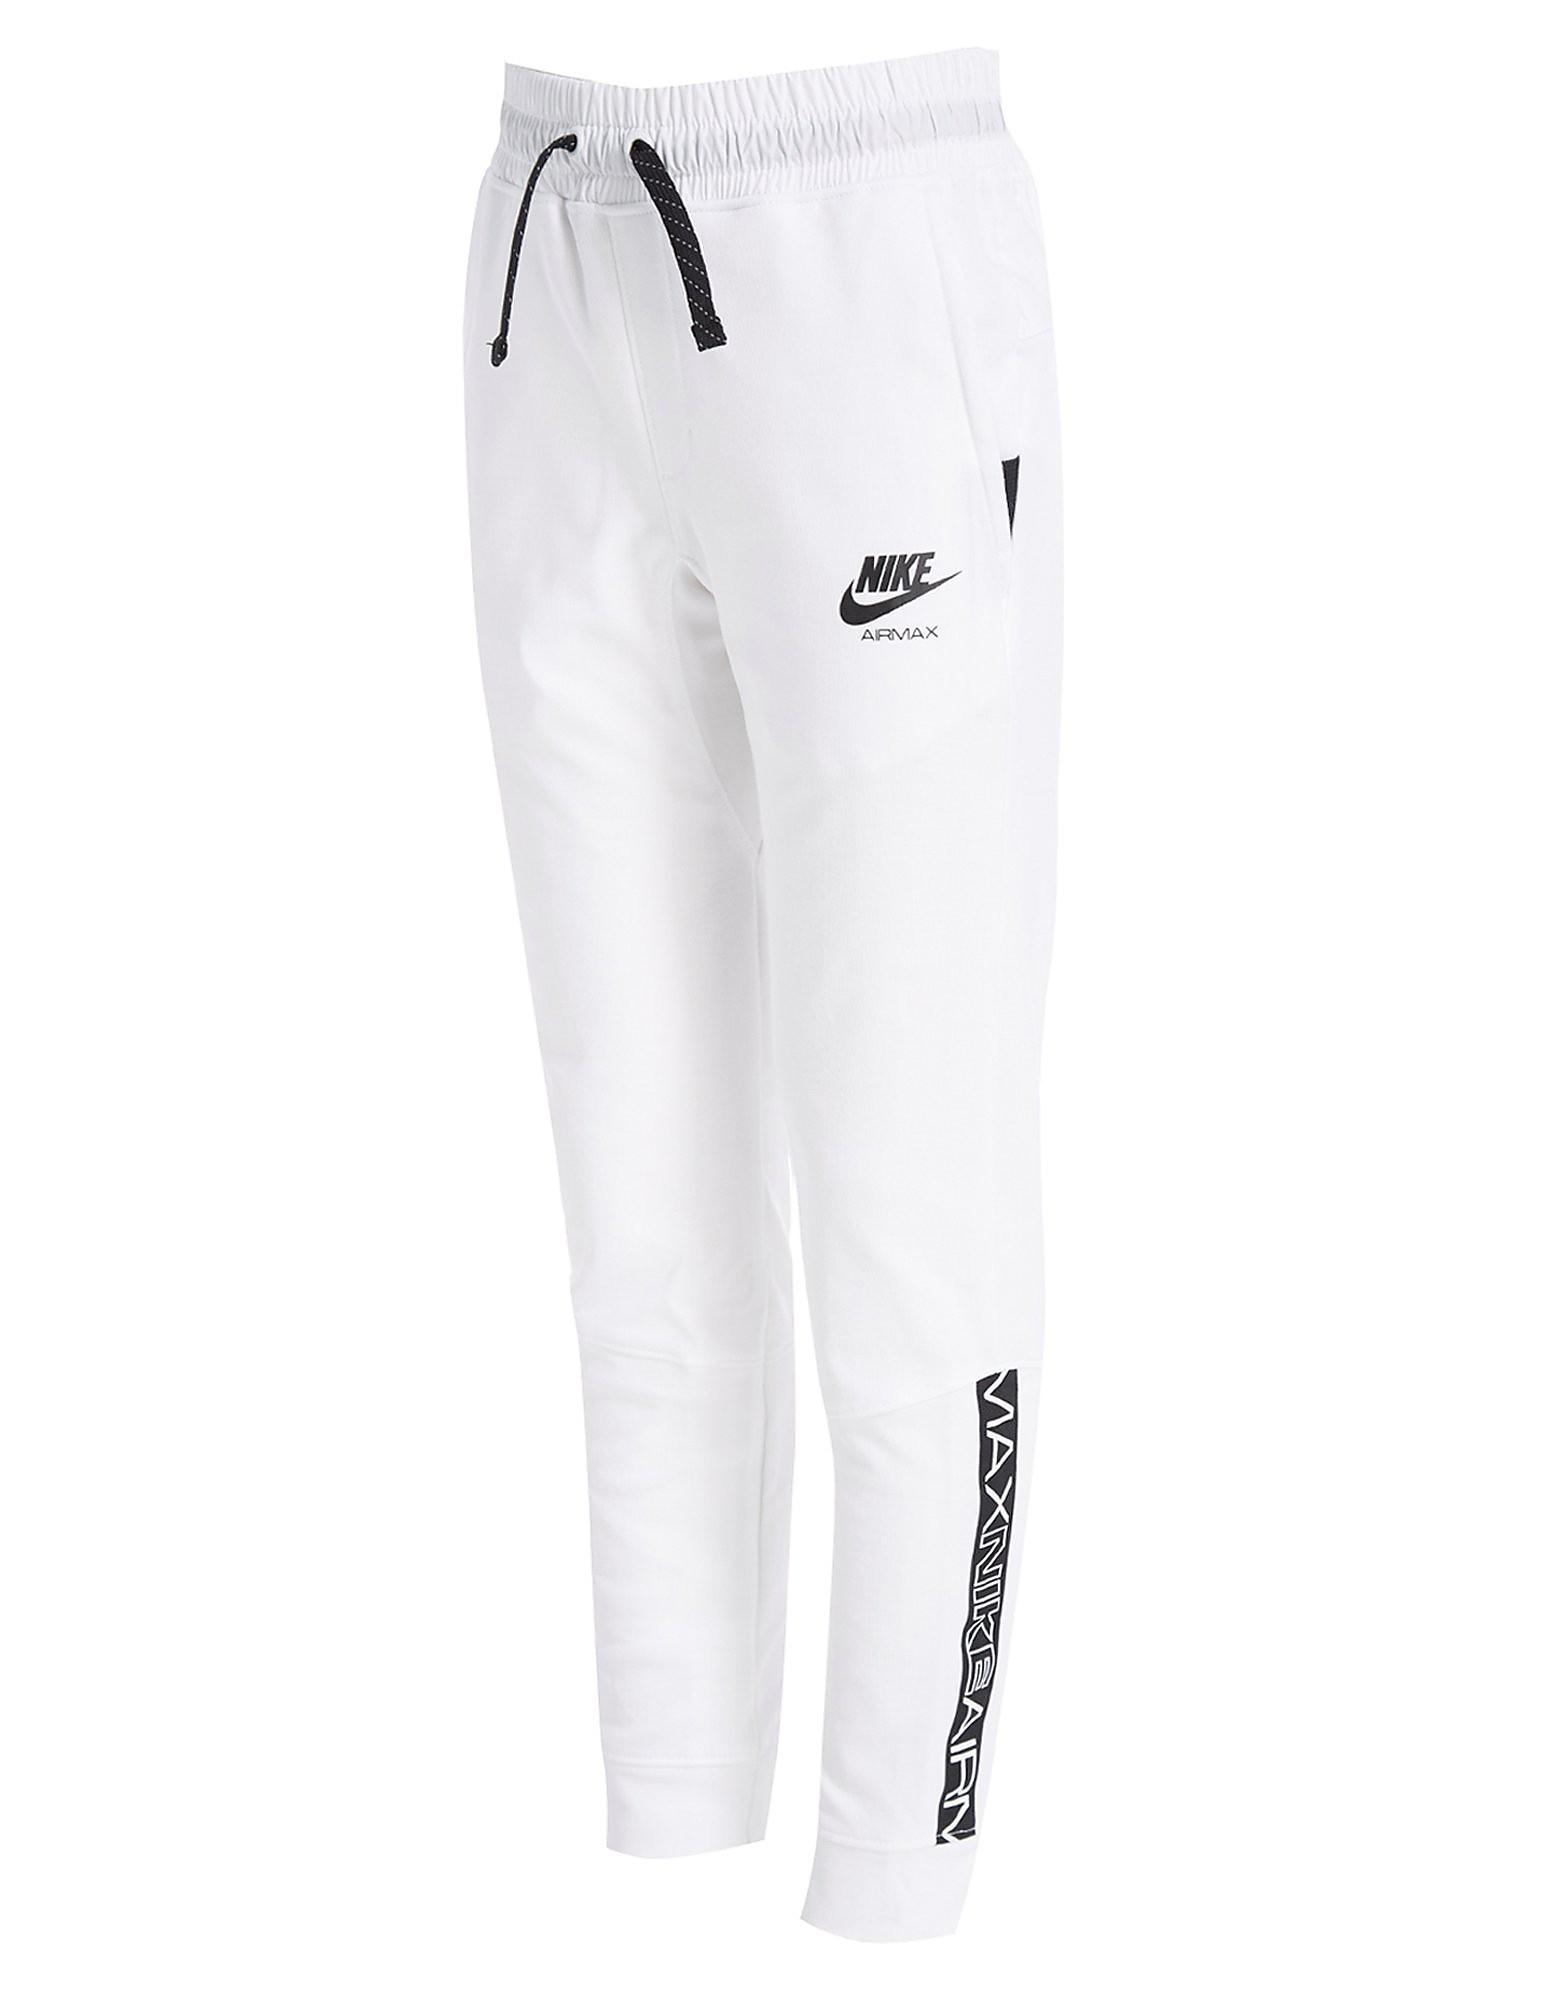 Nike Pantalon de survêtement Air Max Junior